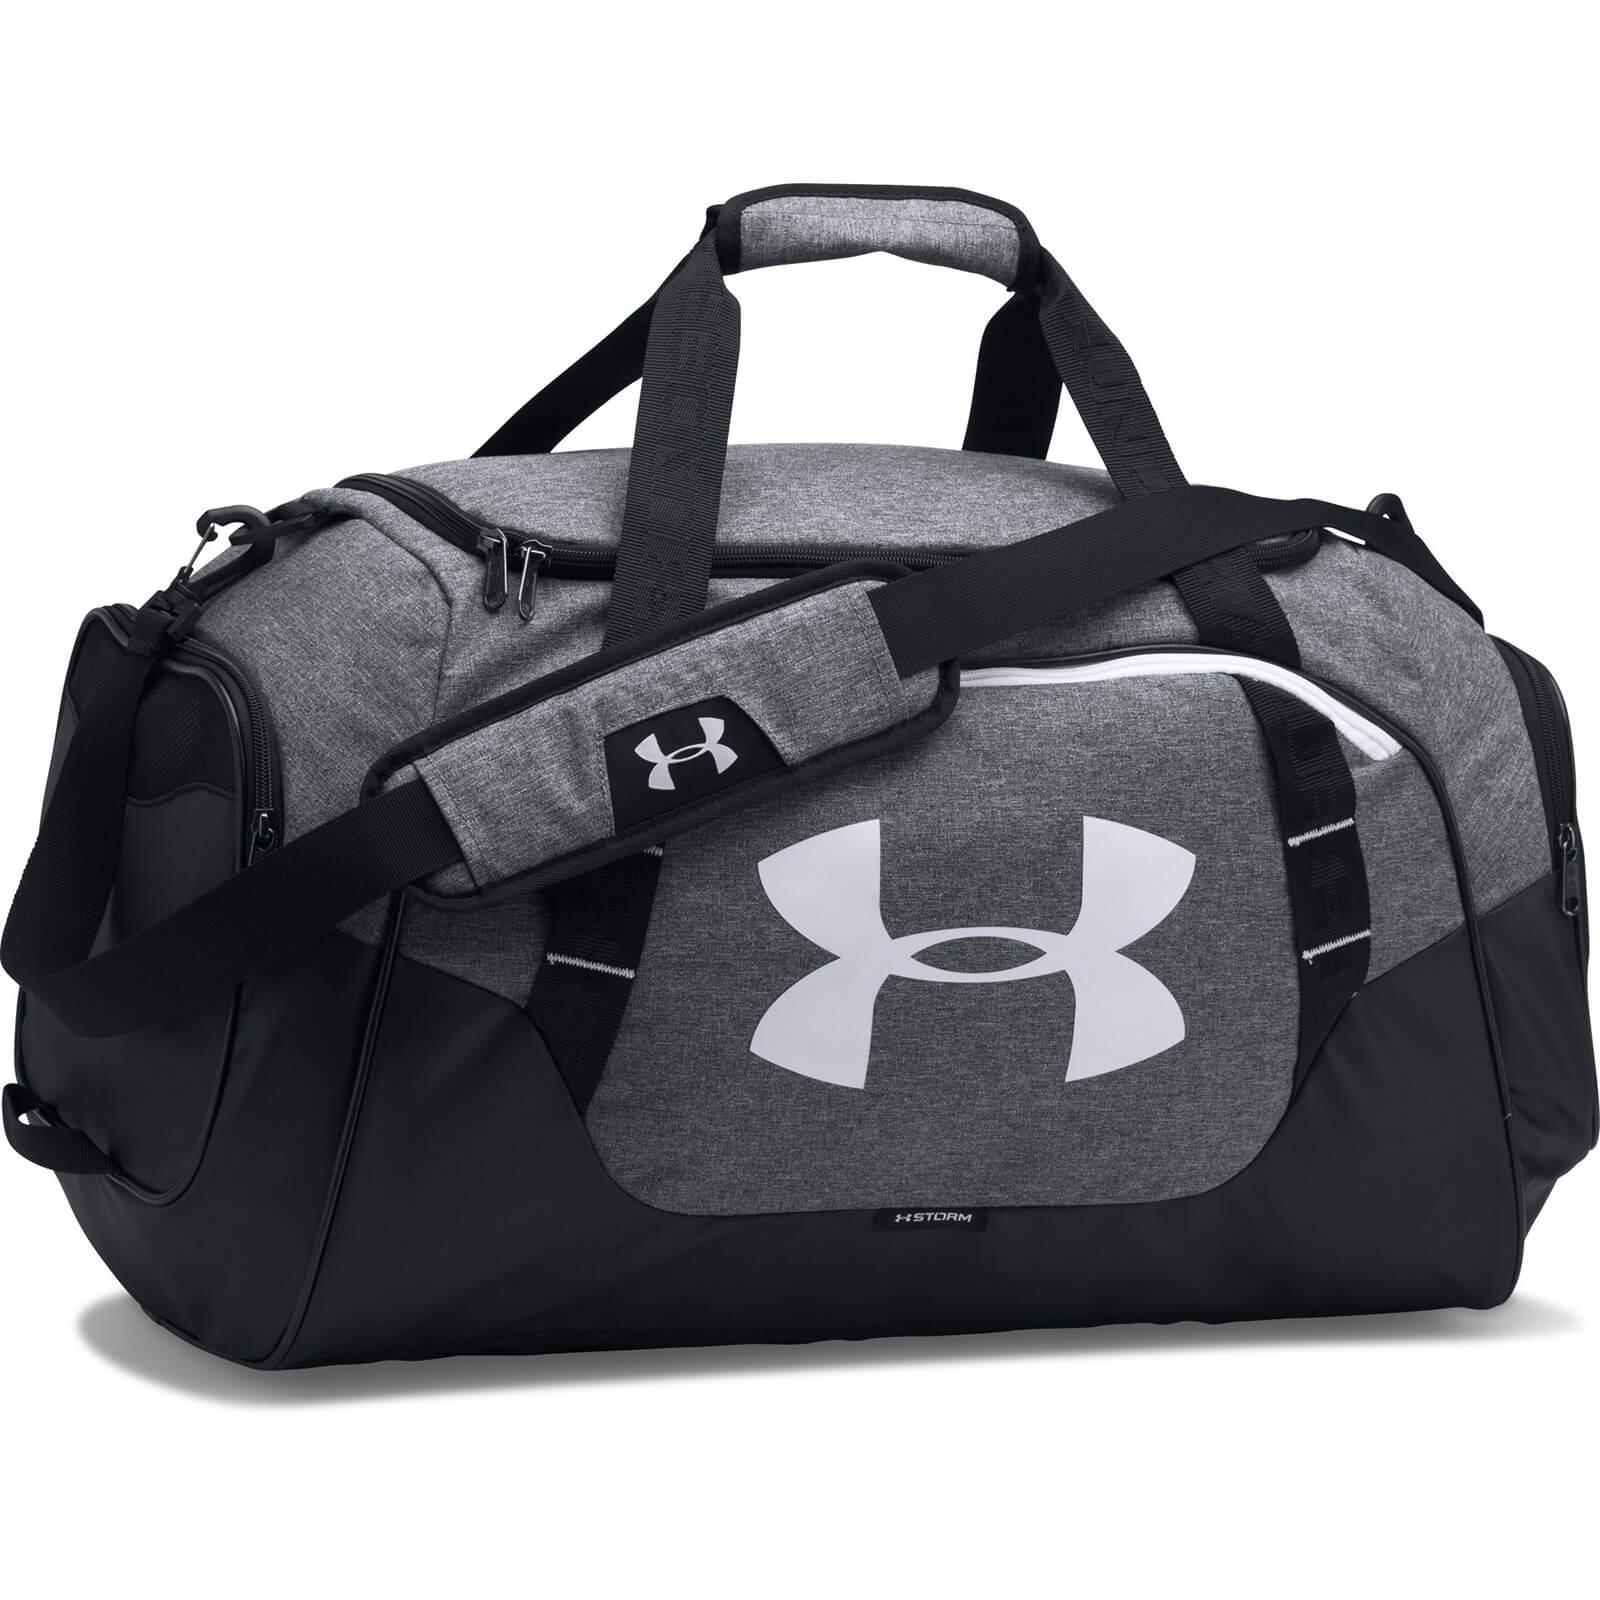 Under Armour Undeniable 3.0 Duffle Bag - Medium - Grey/White